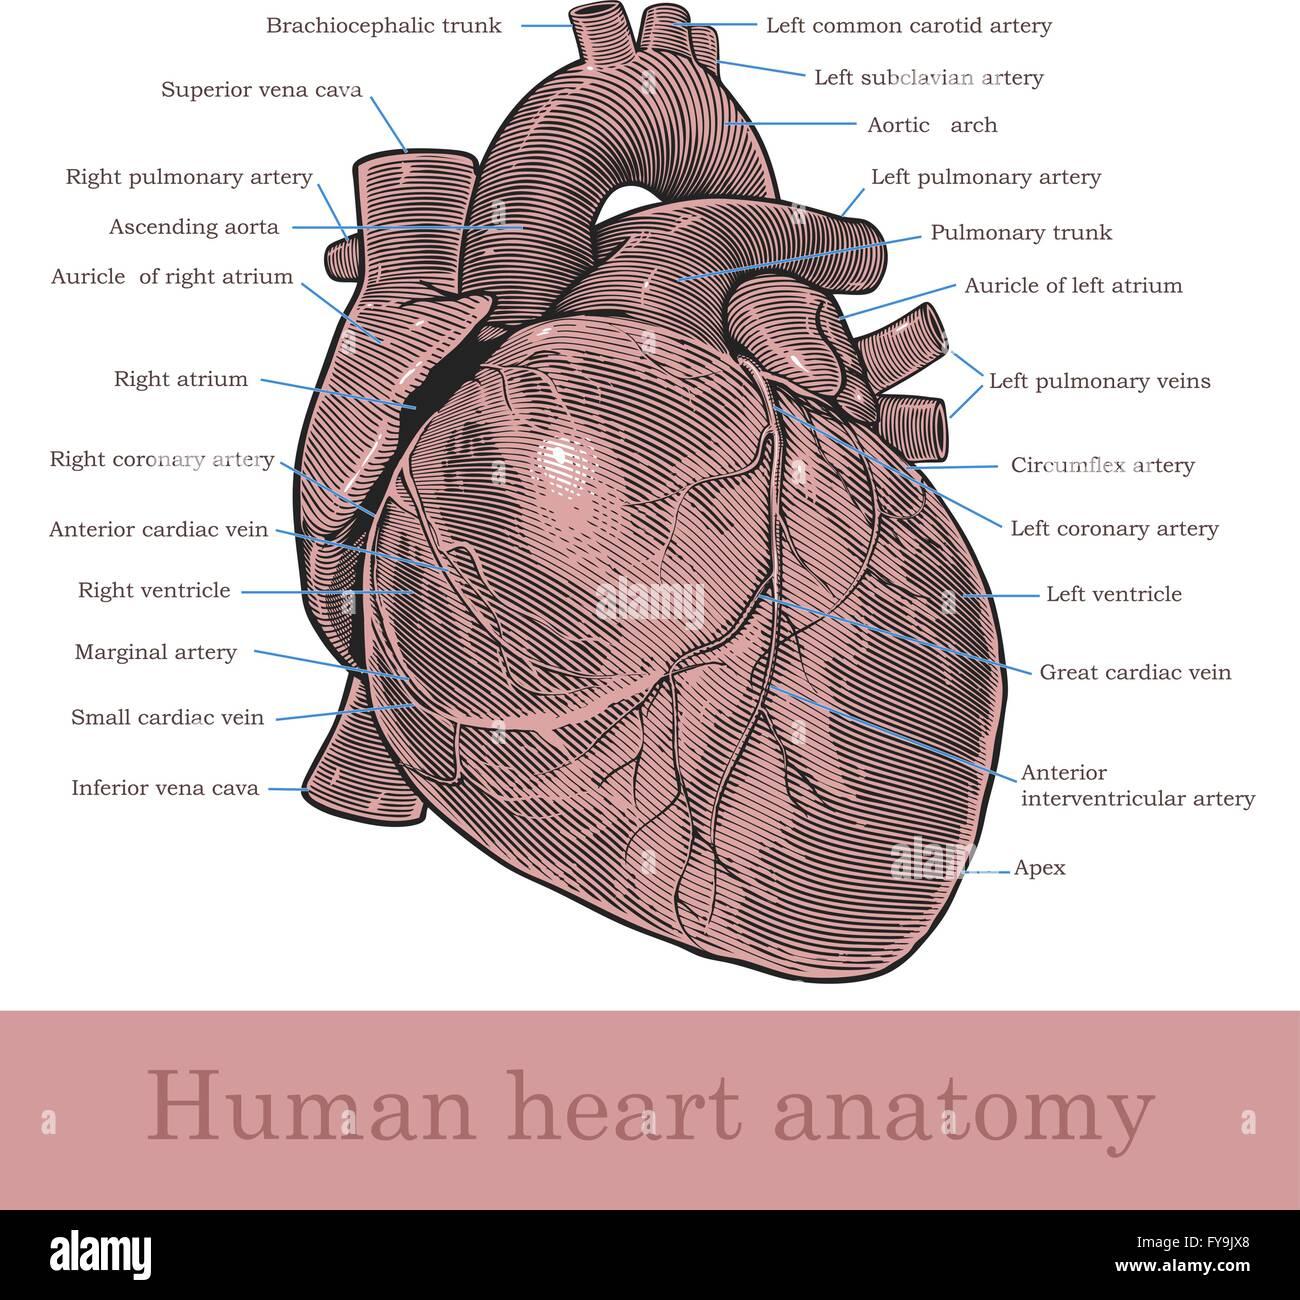 Anatomical Heart Stock Photos & Anatomical Heart Stock Images - Alamy